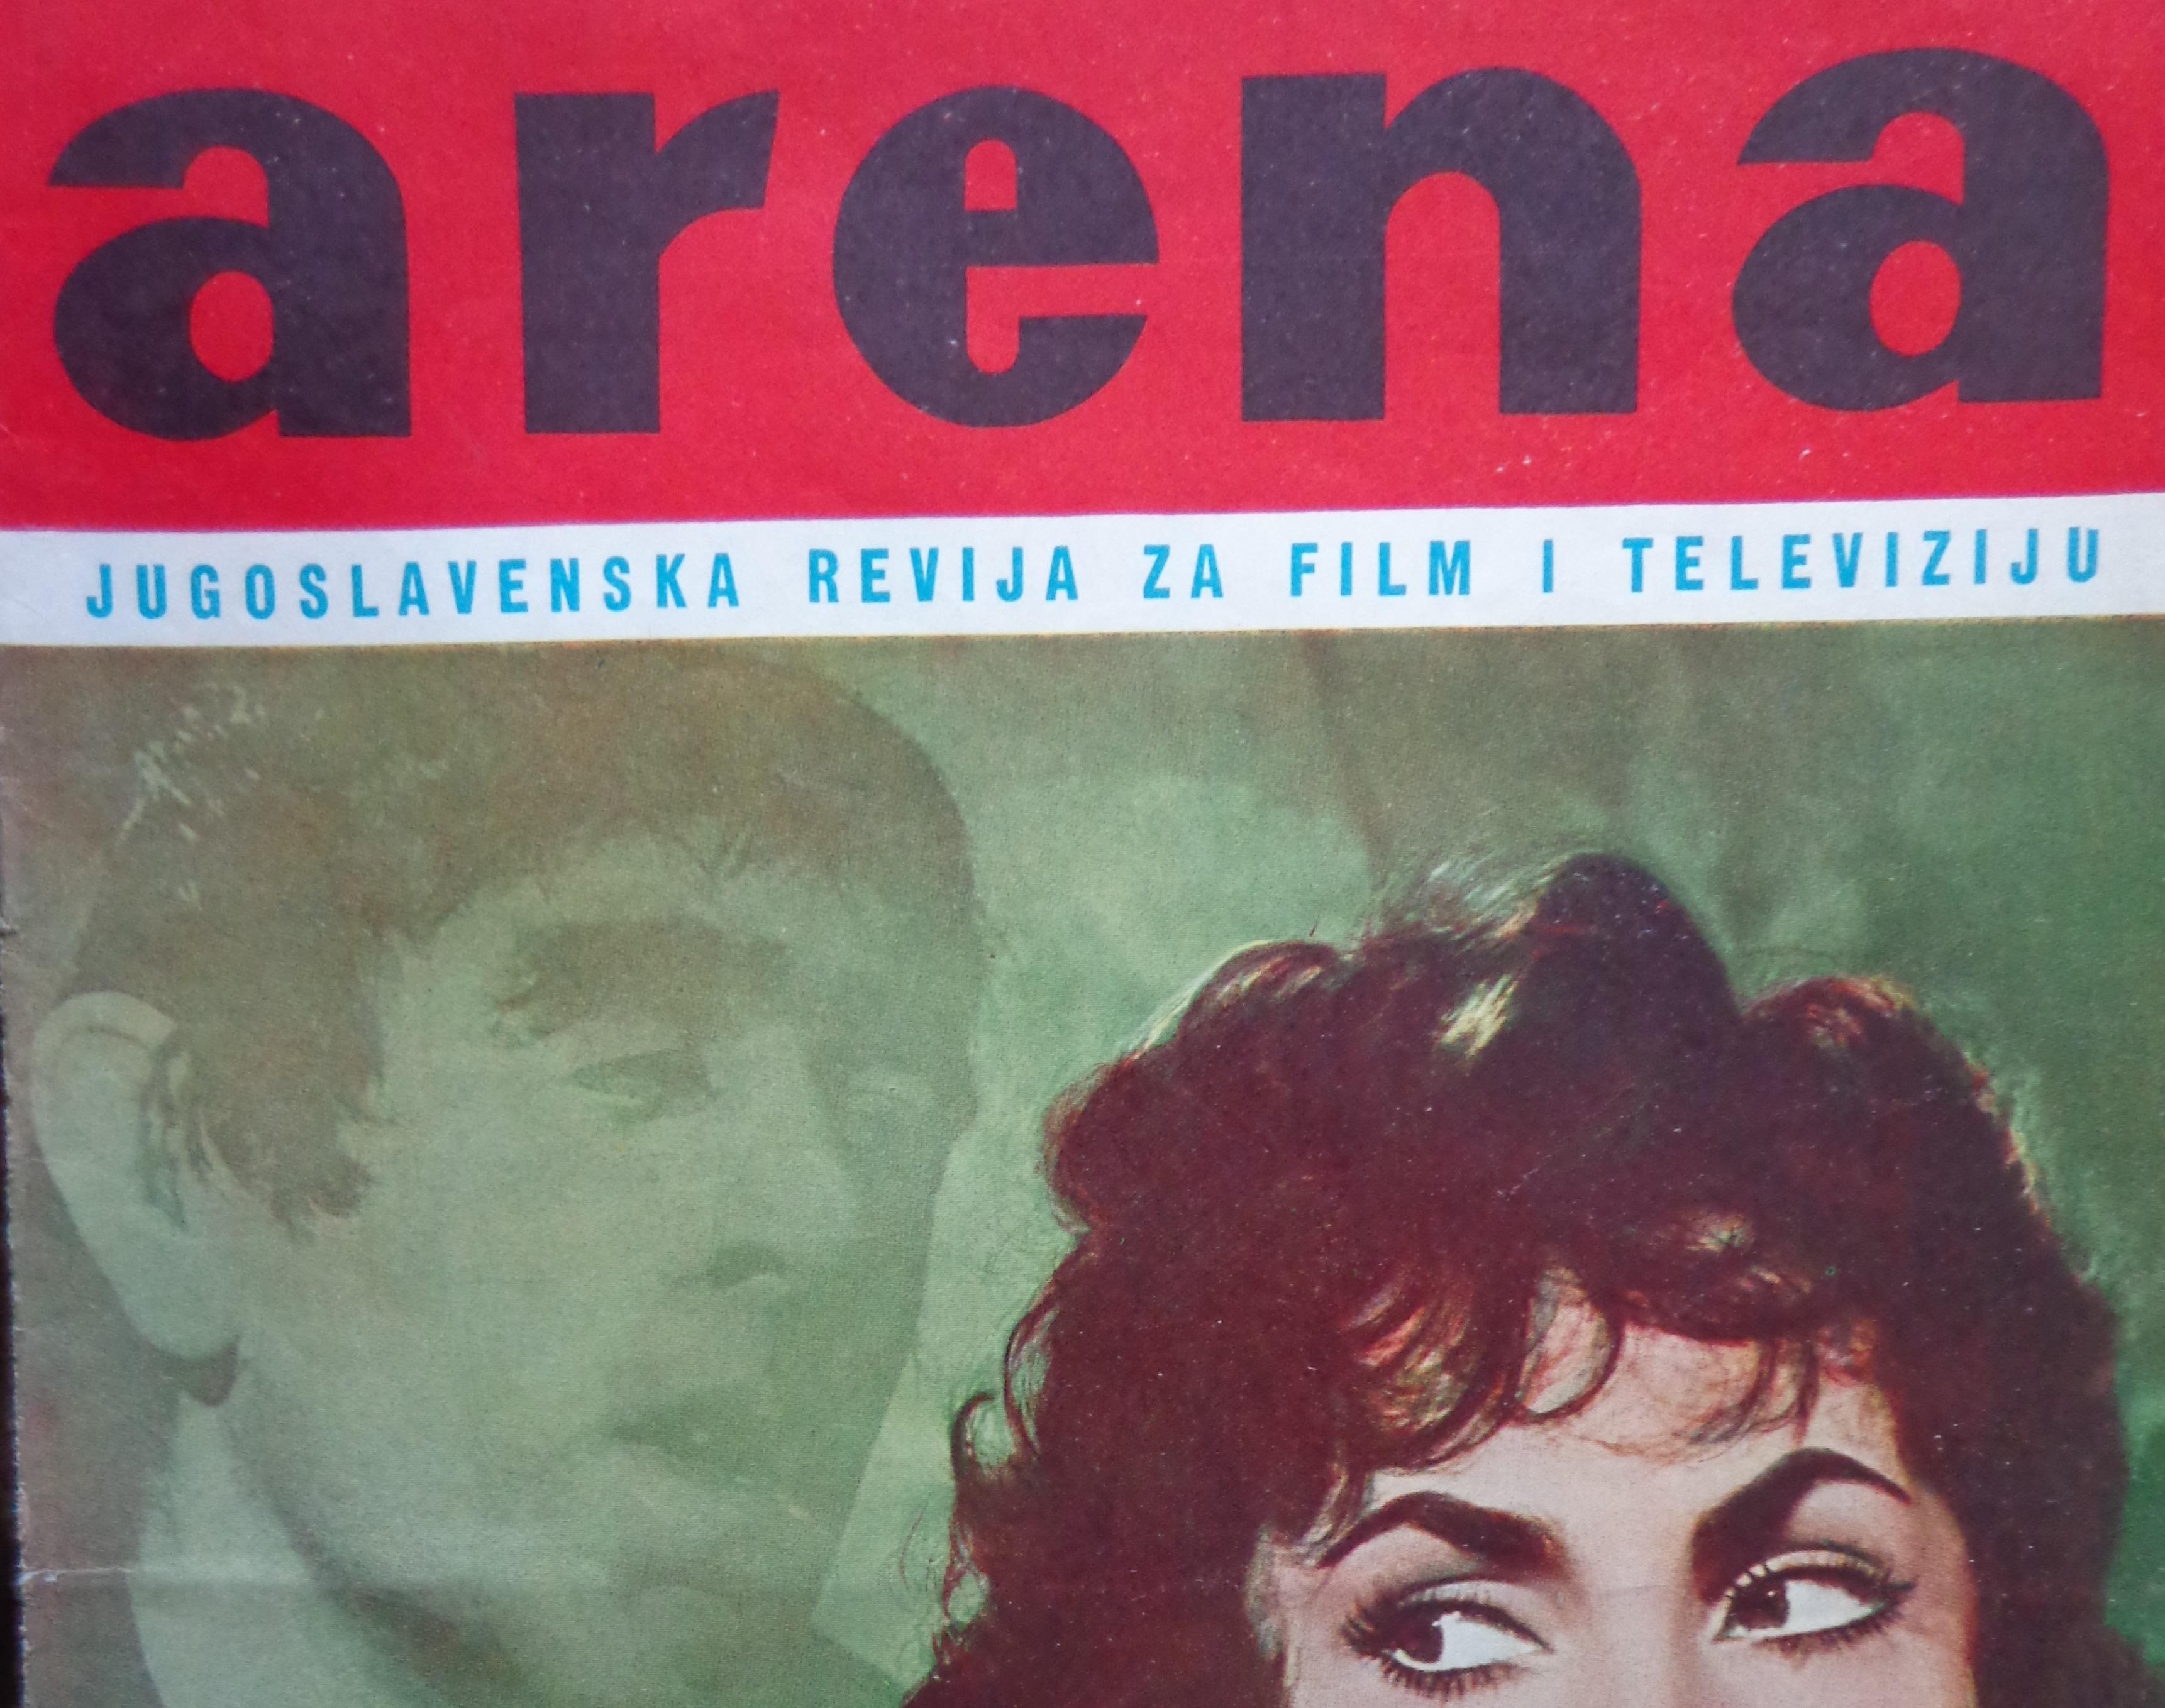 Italian pop culture in Yugoslavia: Transfers and encounters across the Adriatic, 1950s-1960s